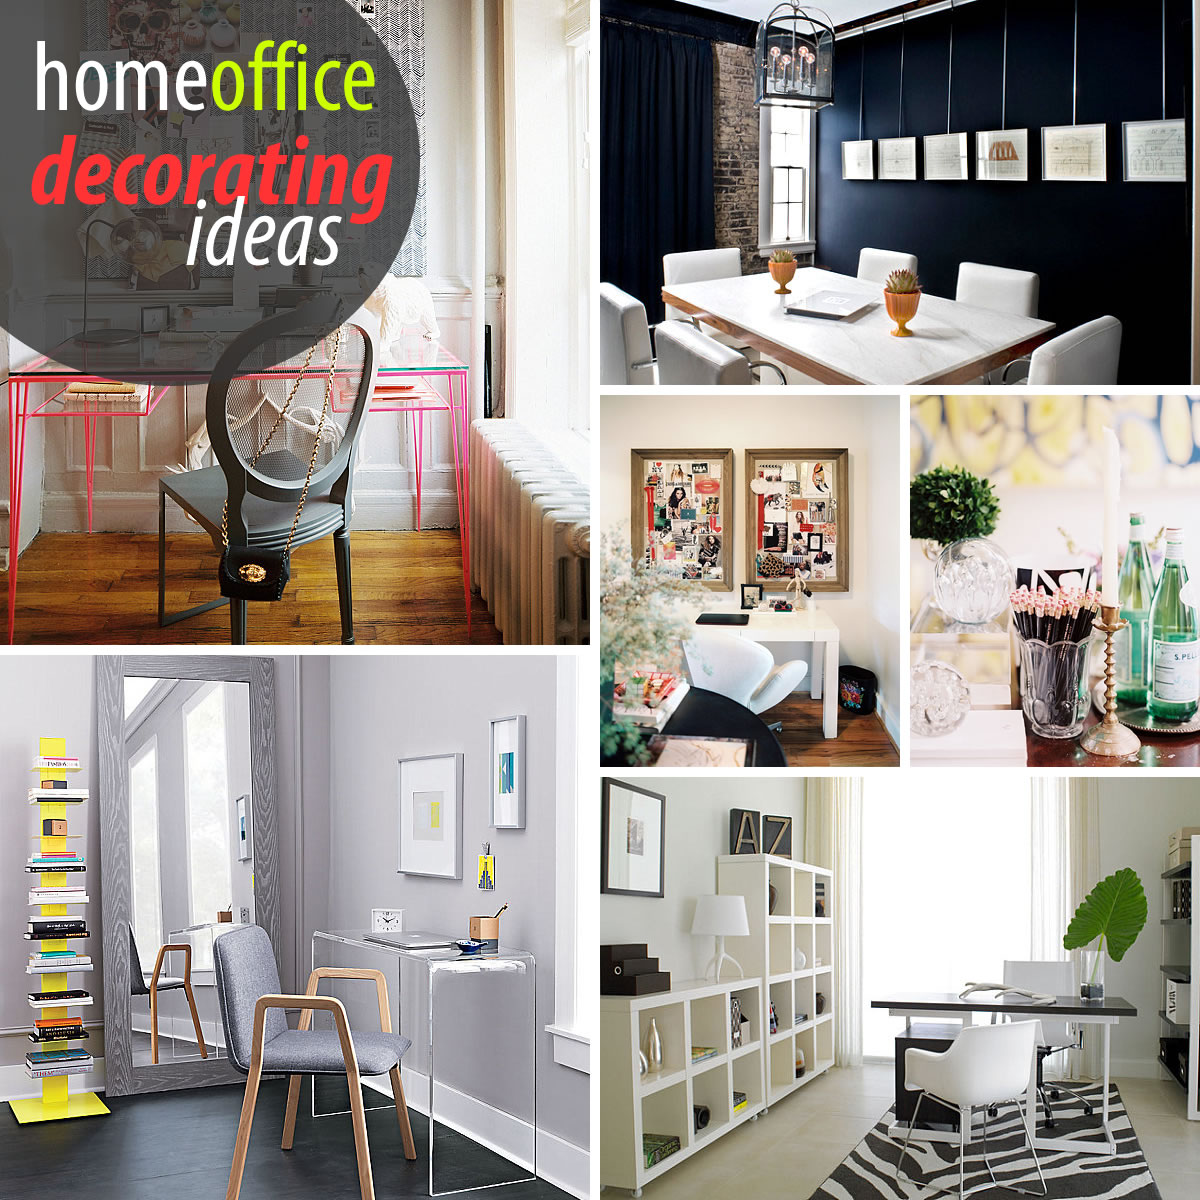 Stupendous Creative Home Office Decorating Ideas Largest Home Design Picture Inspirations Pitcheantrous